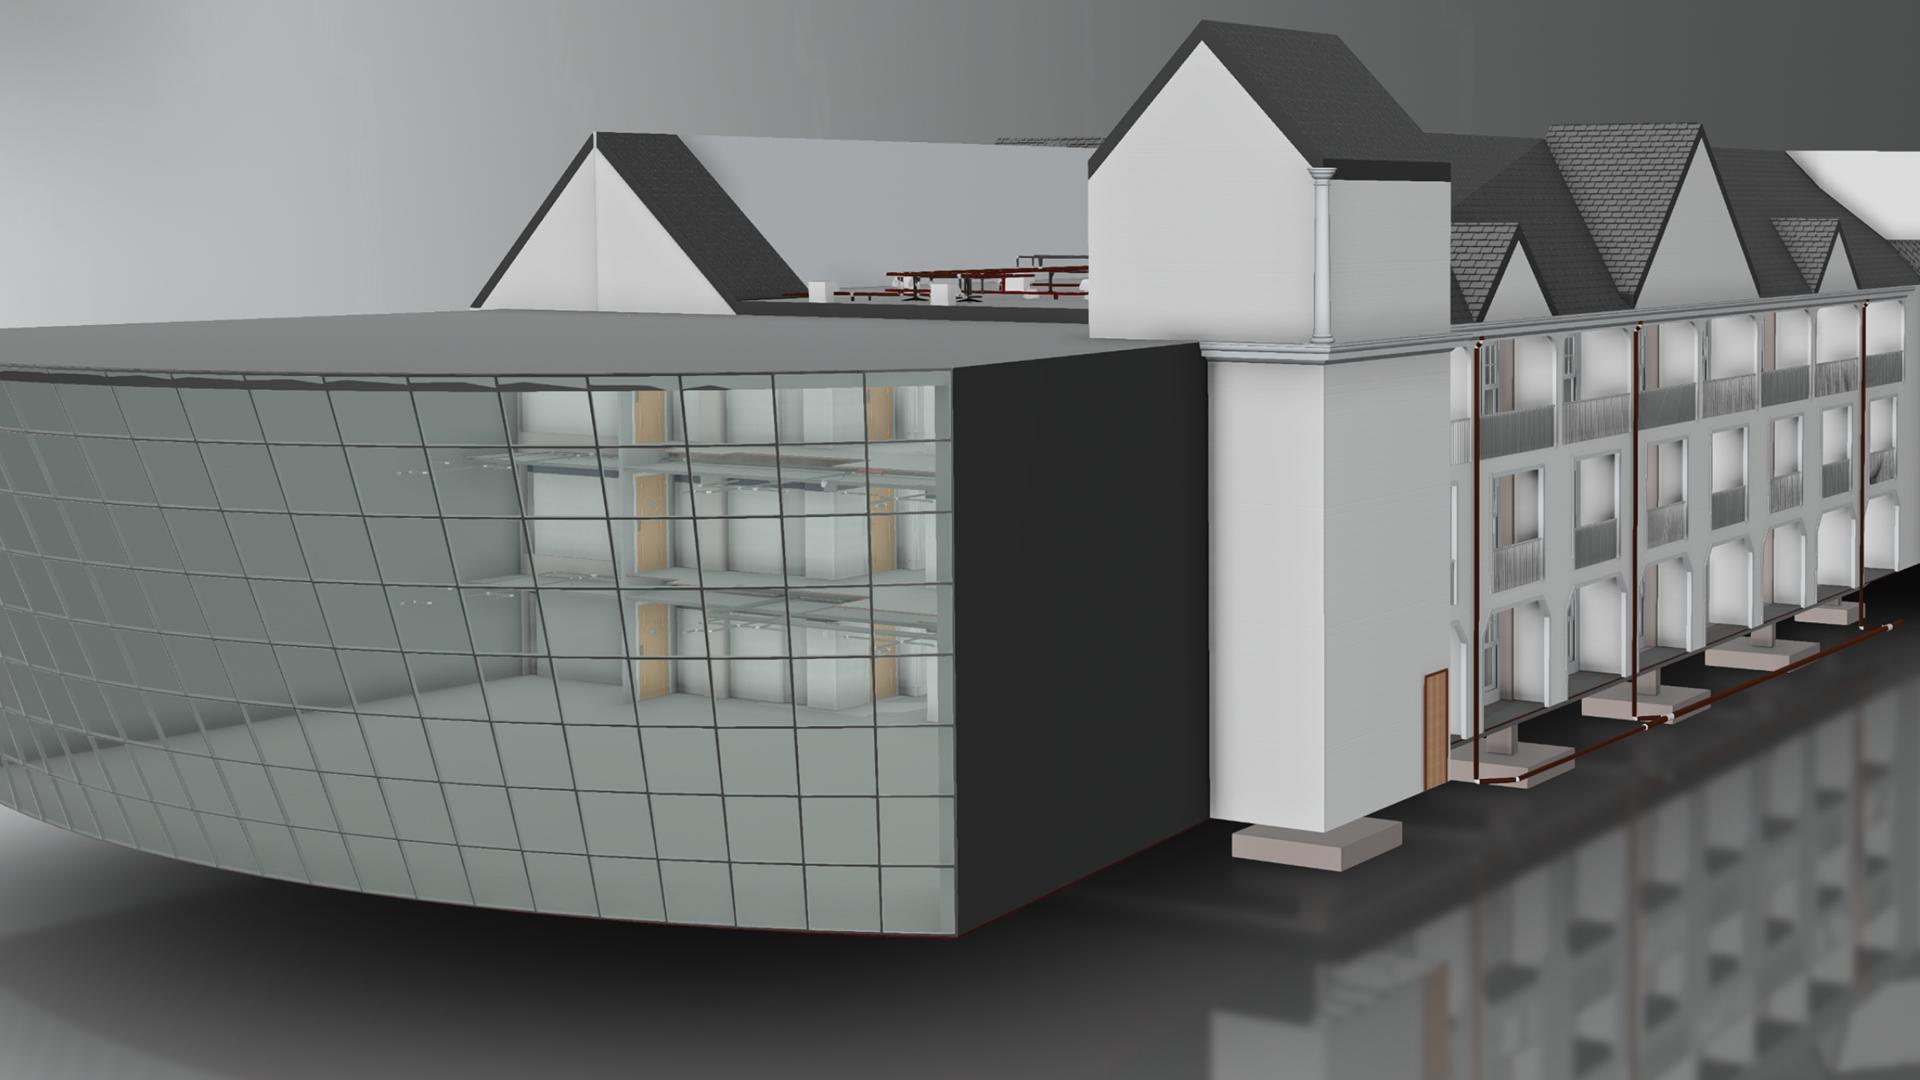 Home designer suite roof tutorial 28 images home design software tutorial 28 images for 3d home architect design deluxe 8 tutorial